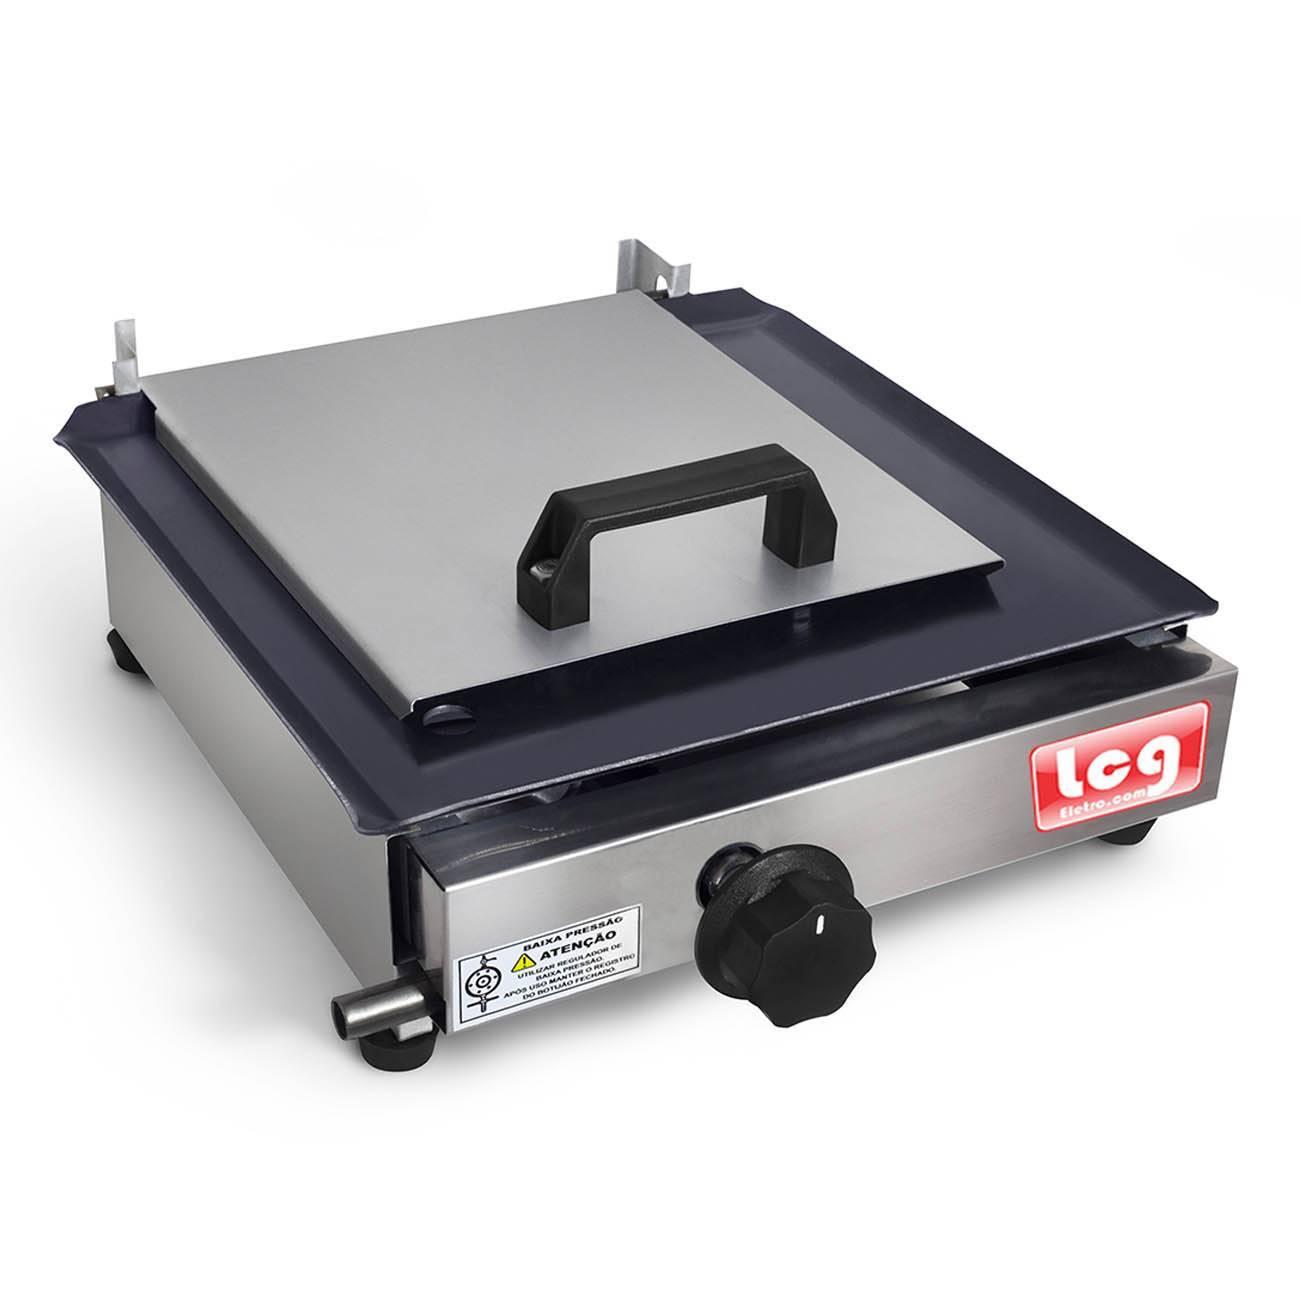 Chapa De Lanche A Gás Sanduicheira 30x30cm Lcg + Kit Gás - LCGELETRO